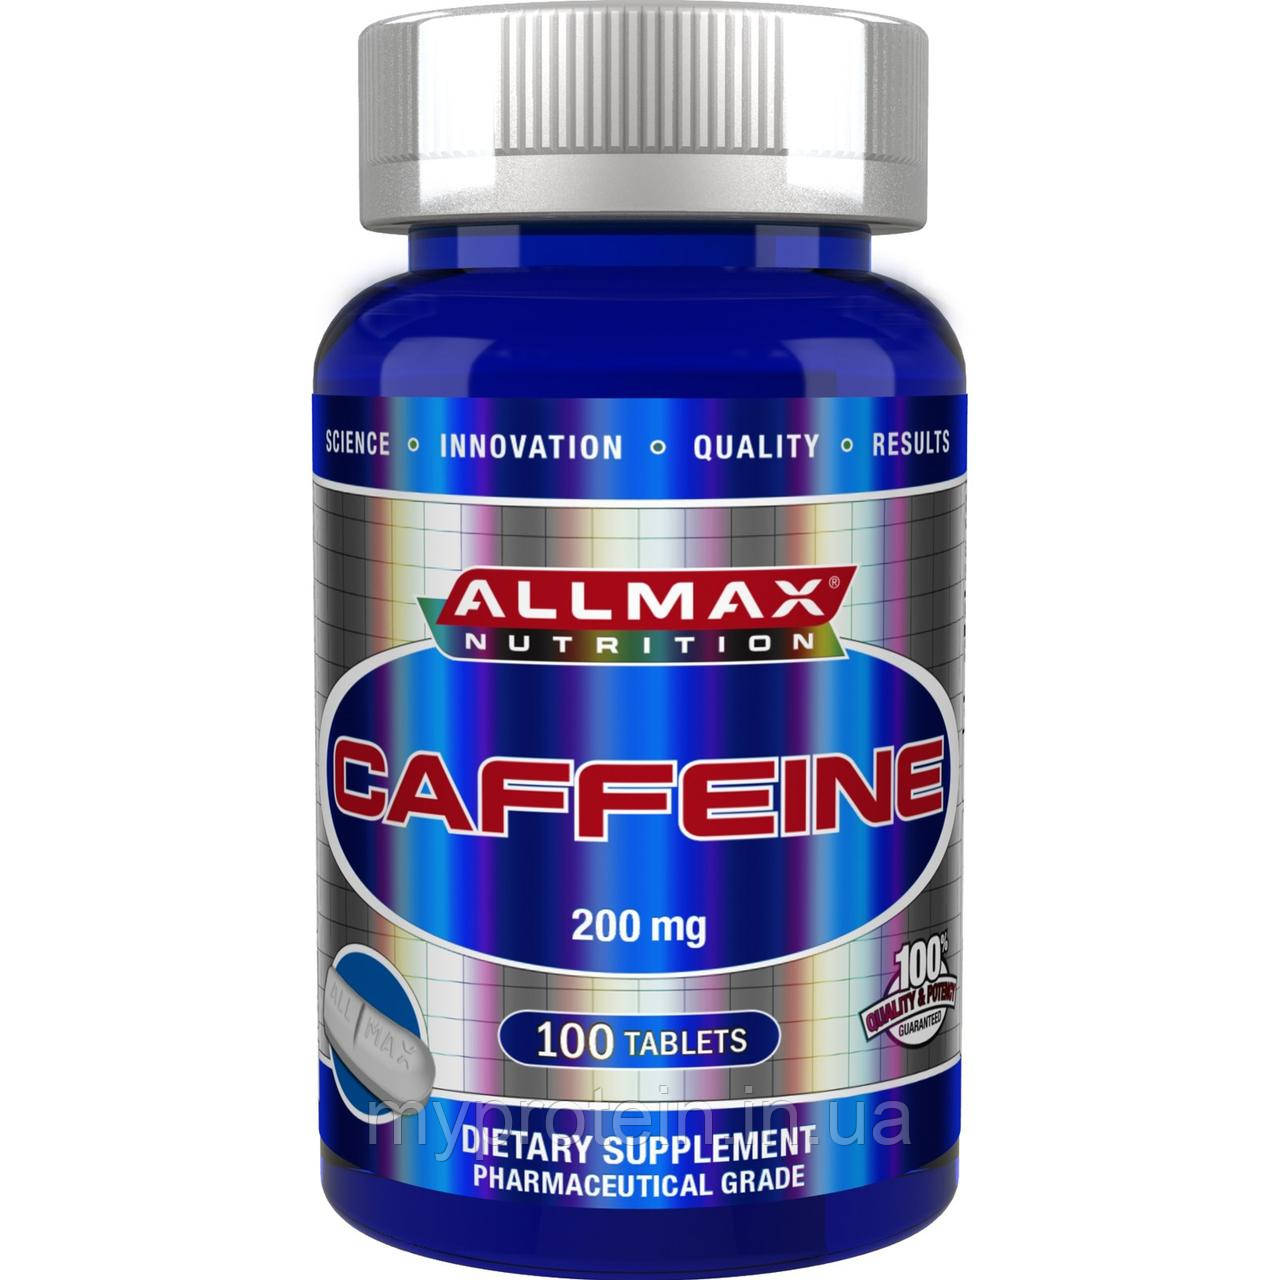 All Max Nutrition Энергетики Caffeine 200 mg100 tab